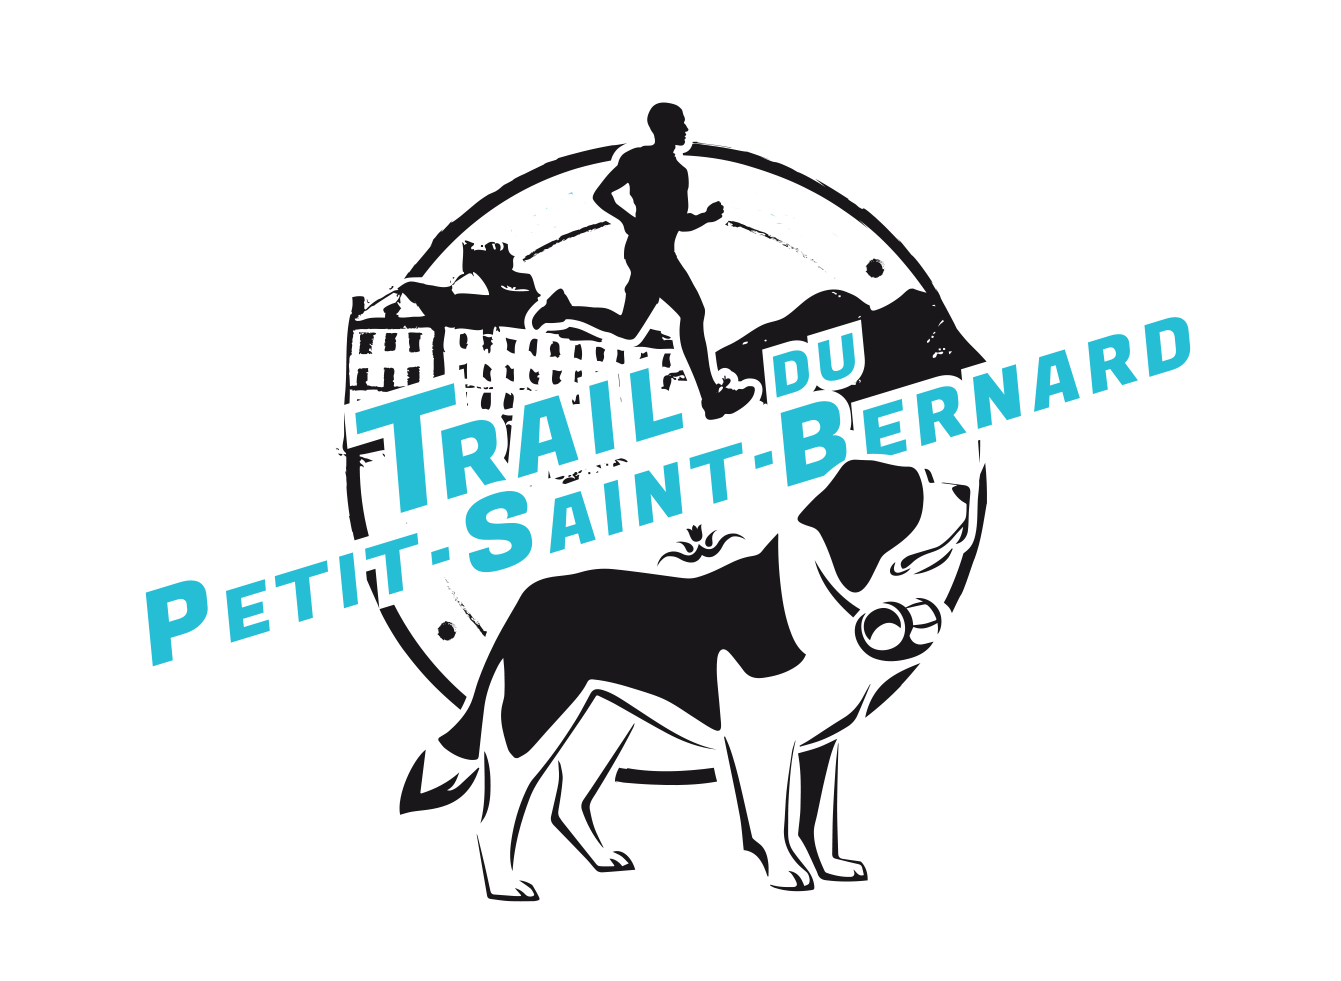 Trail PSB logo 3 - NOUVEAU: TRAIL DU PETIT SAINT BERNARD (73) 02 OCTOBRE 2016